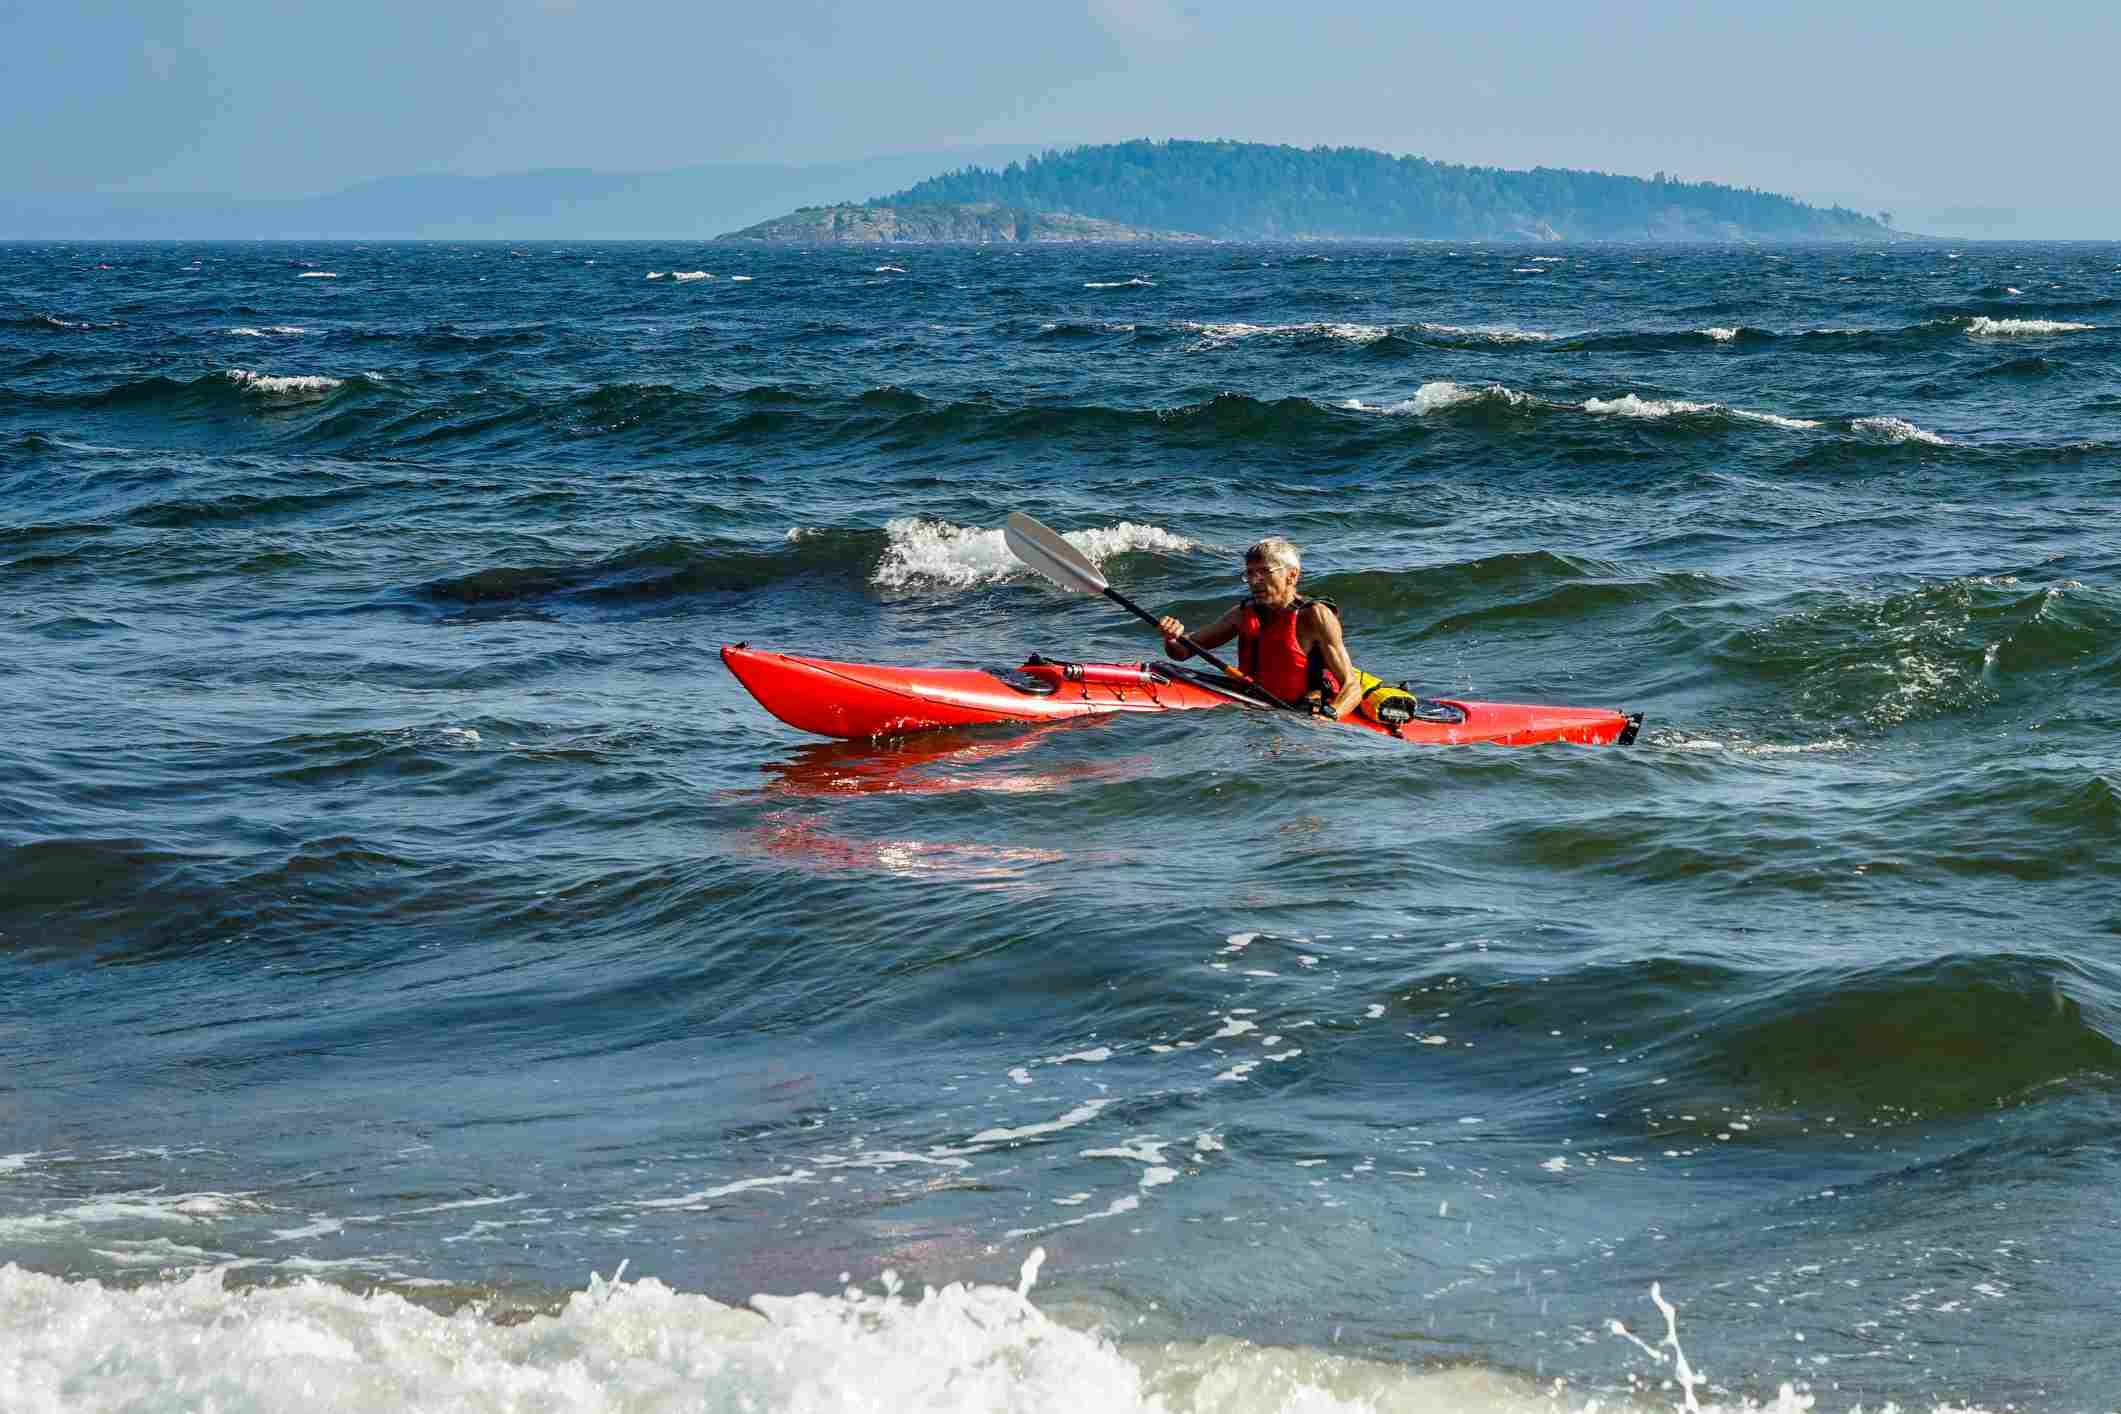 Kayak paddling at sea